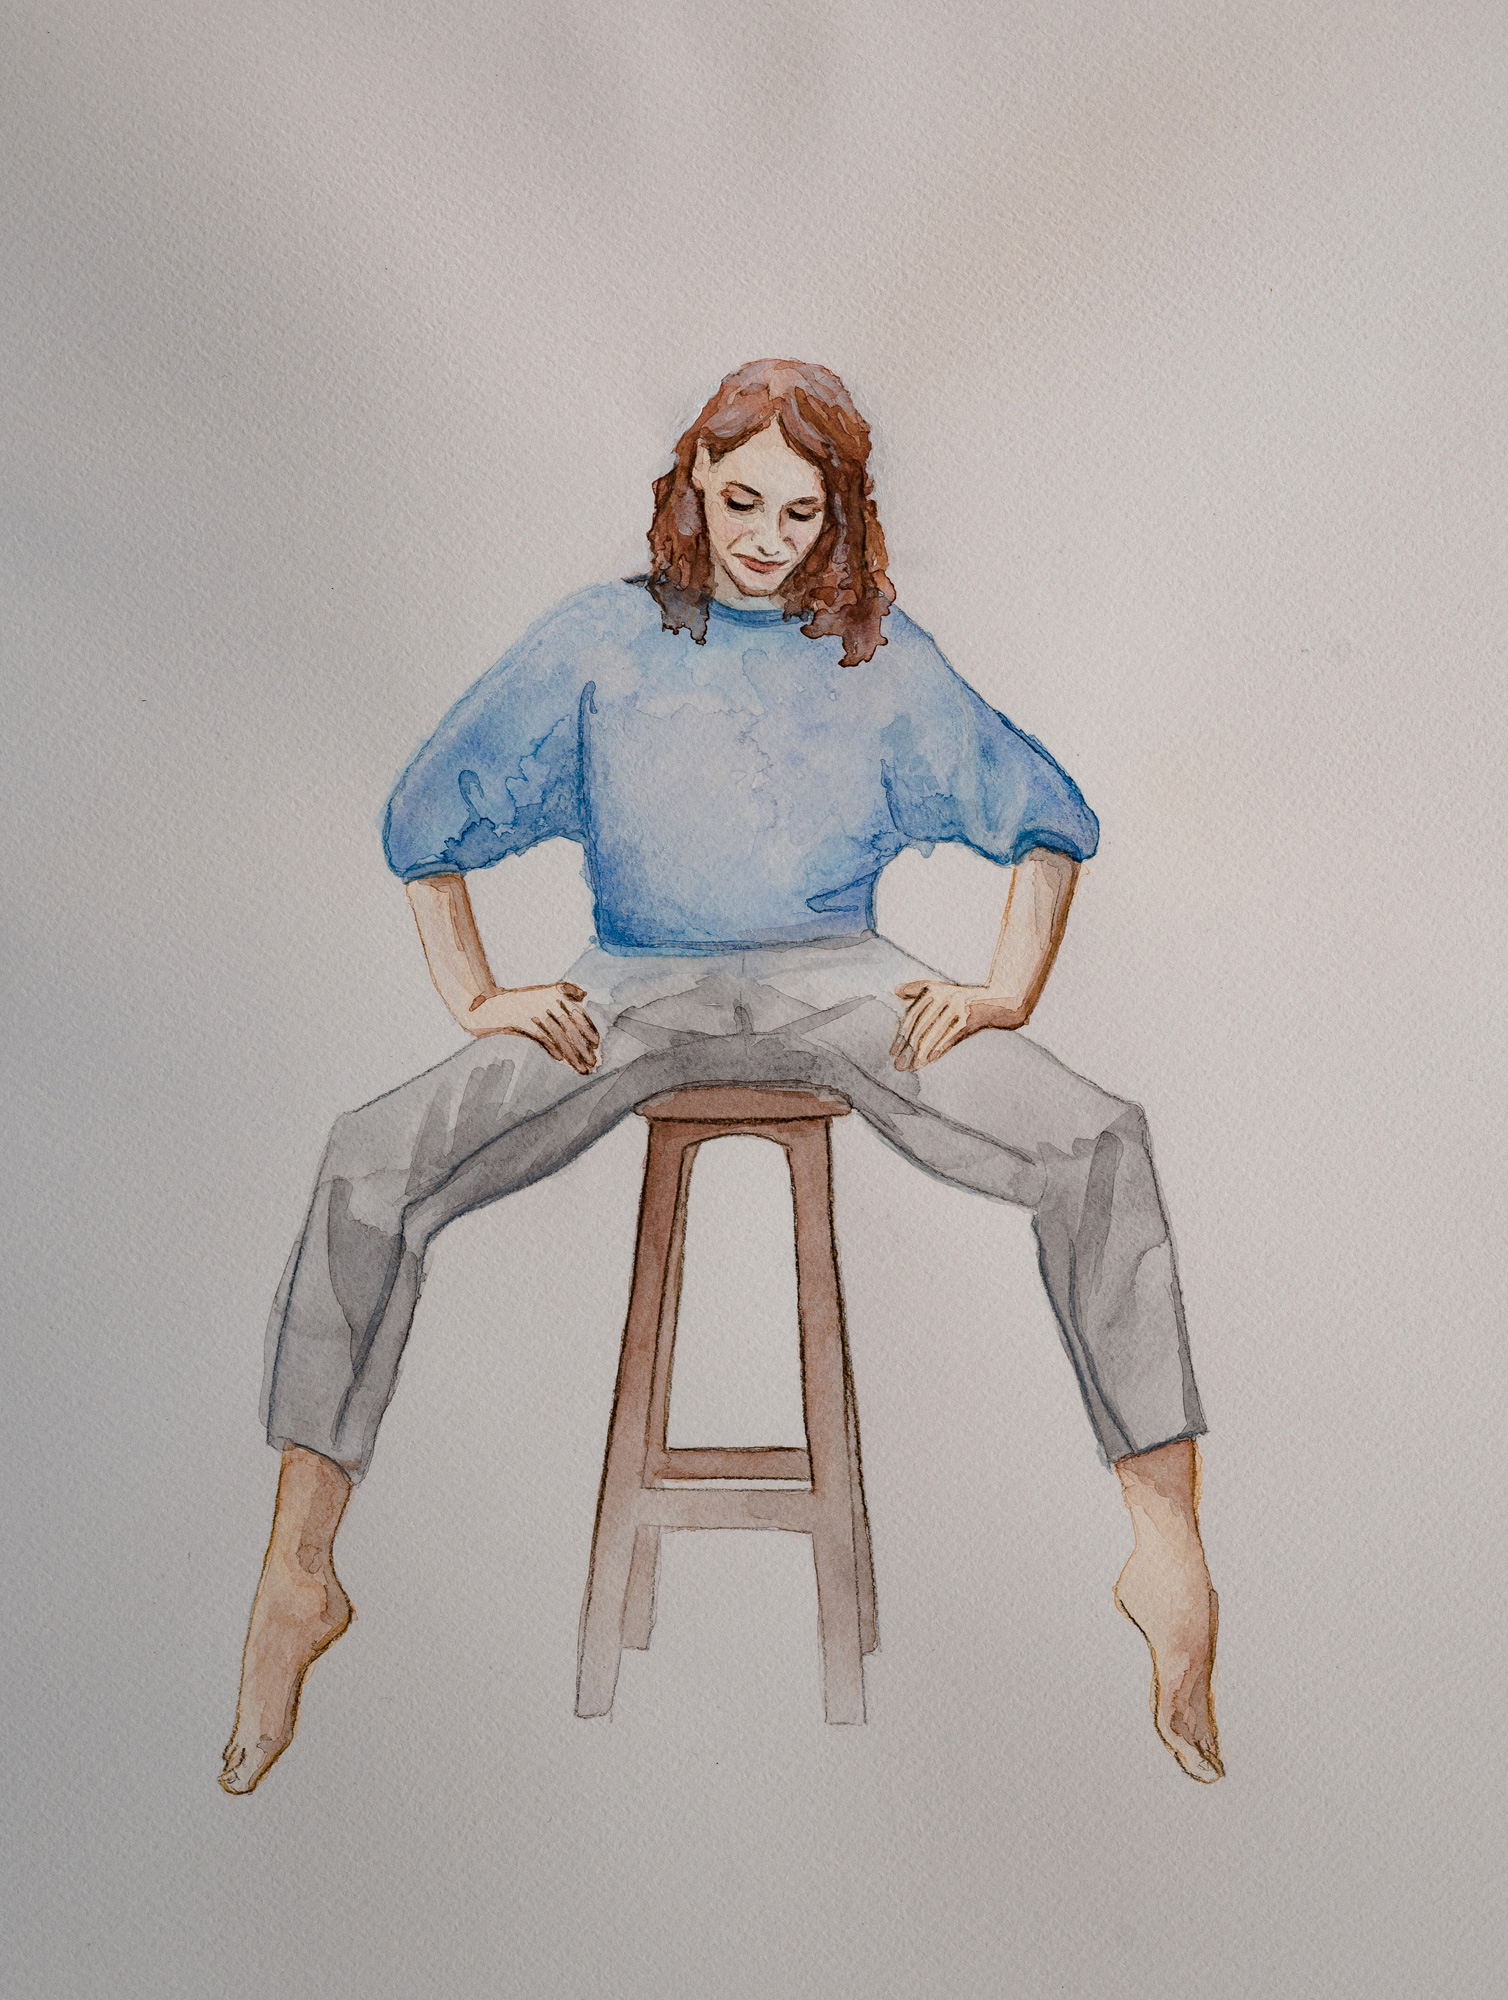 Aquarell-Porträt einer Frau mit blauem Pulli.